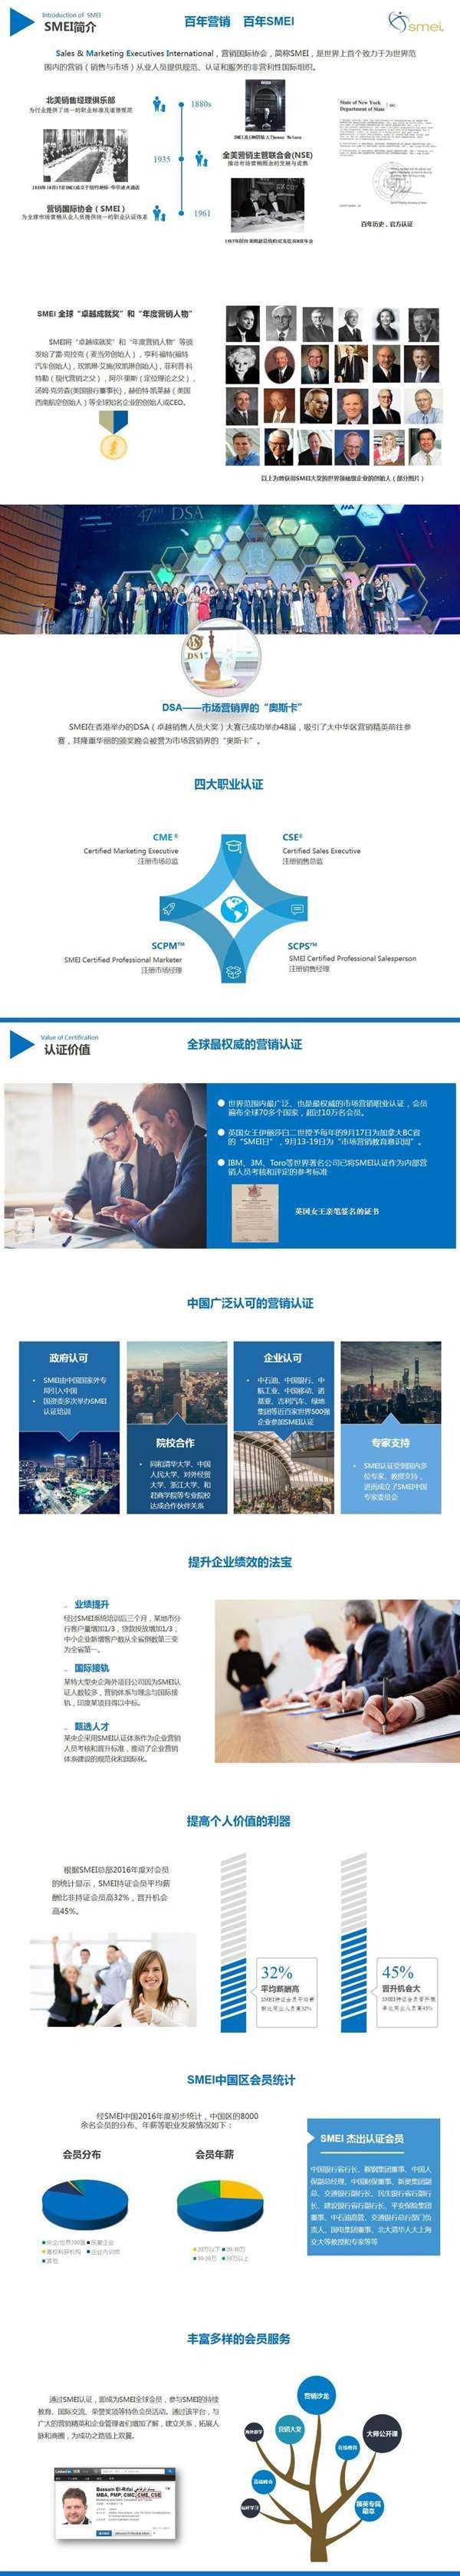 SMEI介绍.jpg